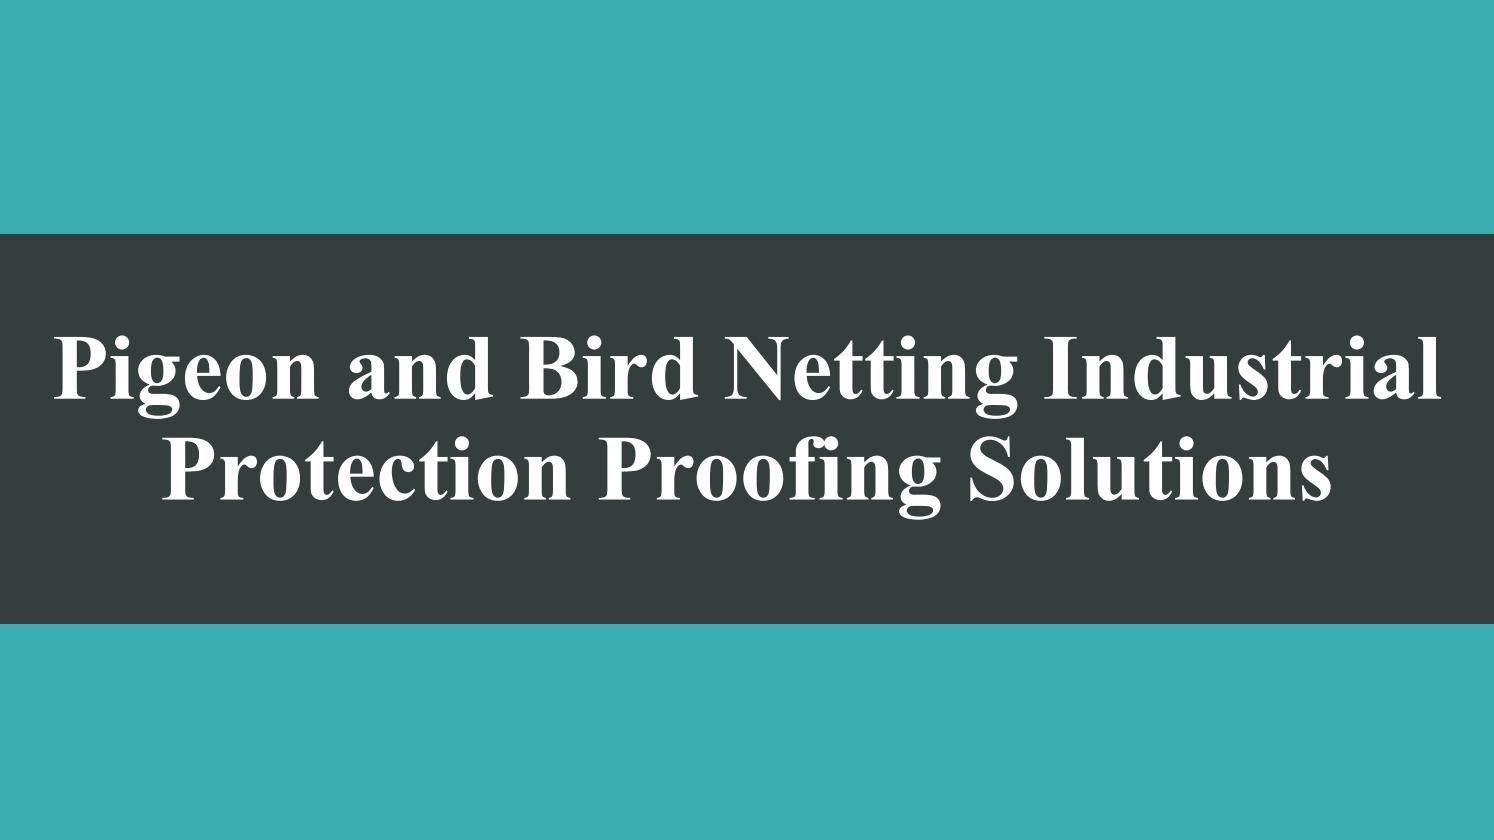 Best industrial bird netting and bird proofing solutions